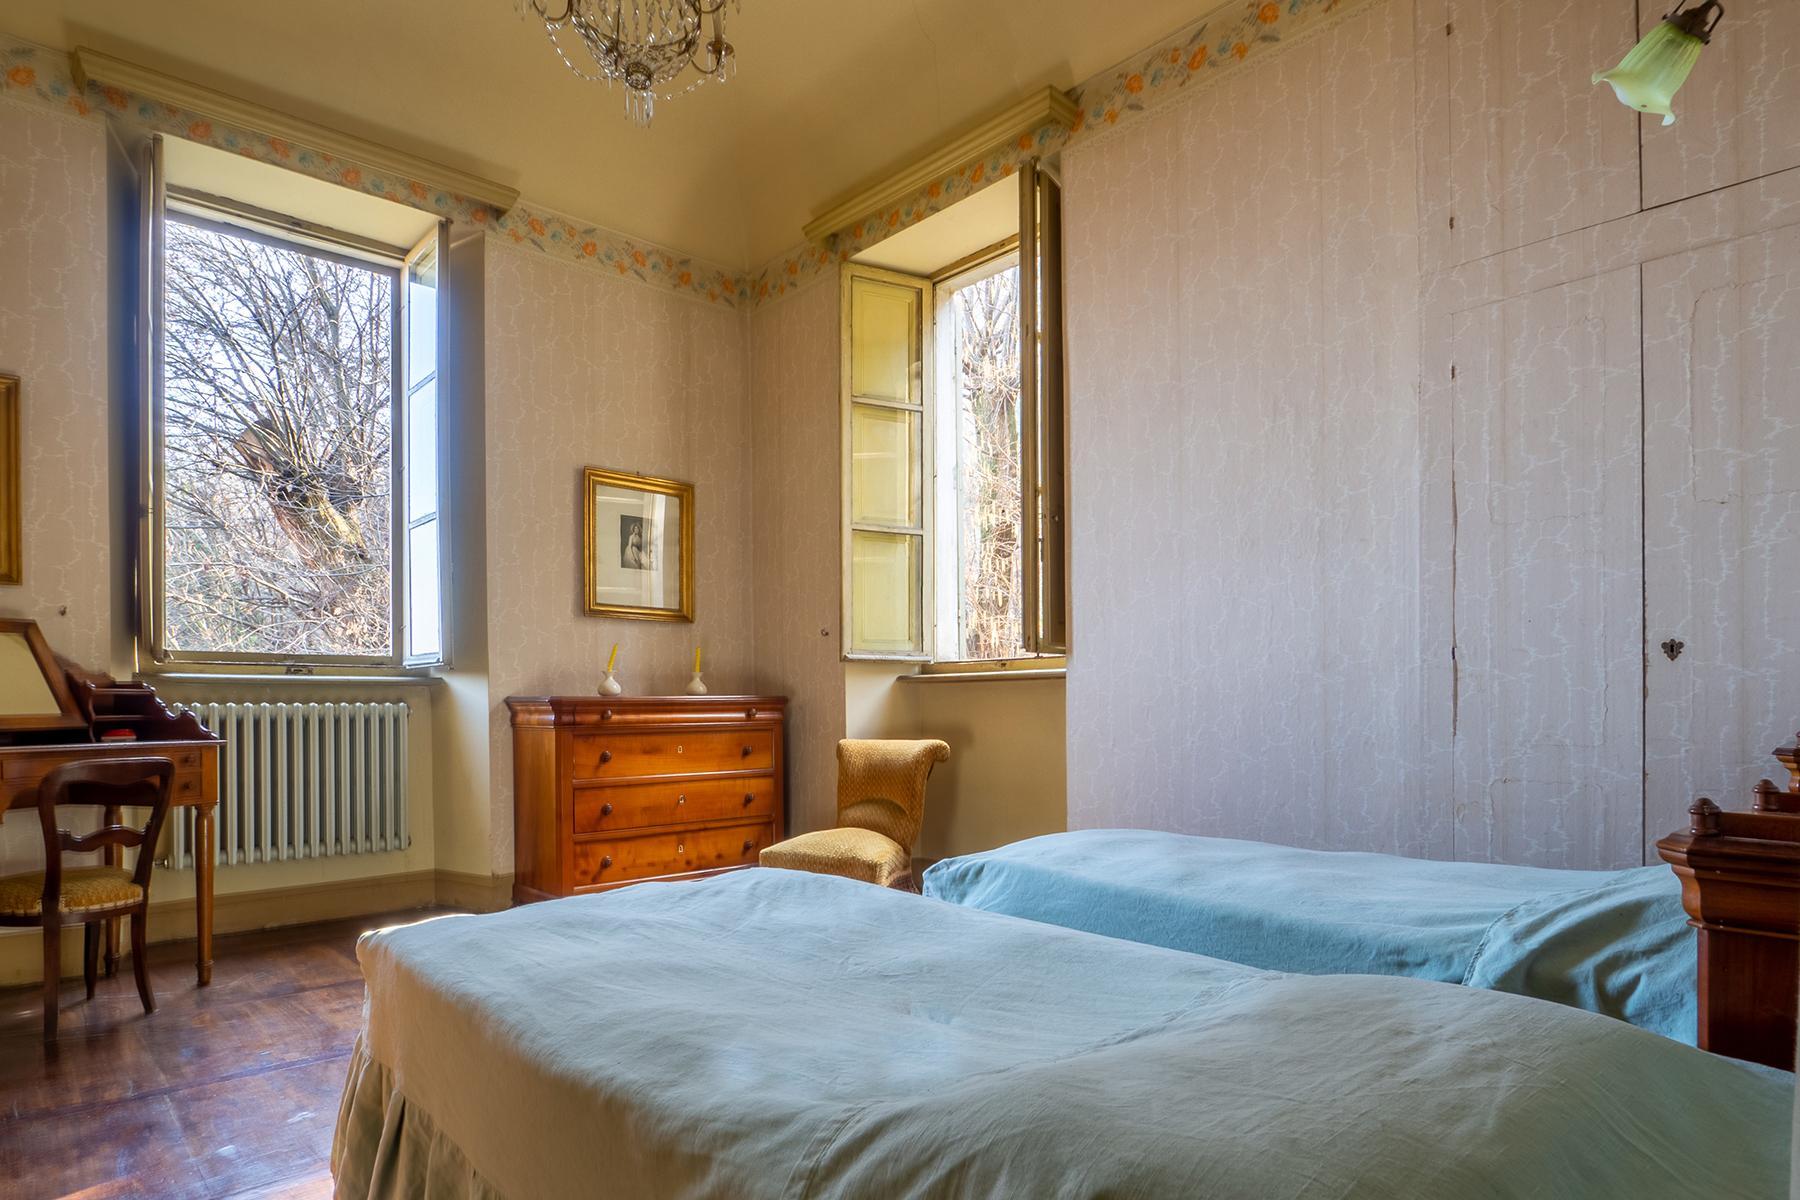 Historical Villa with private garden - 10